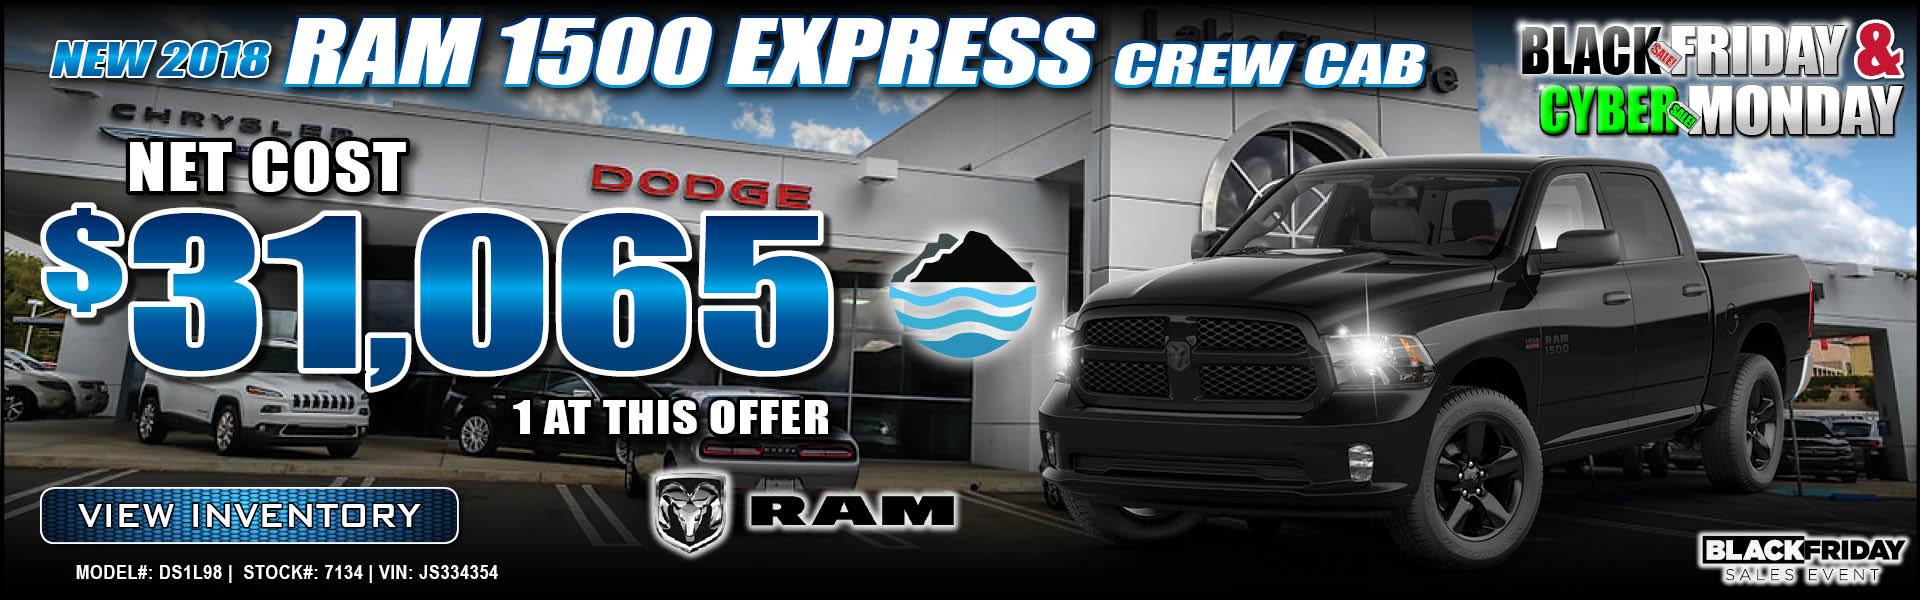 Ram 1500 Express $31,065